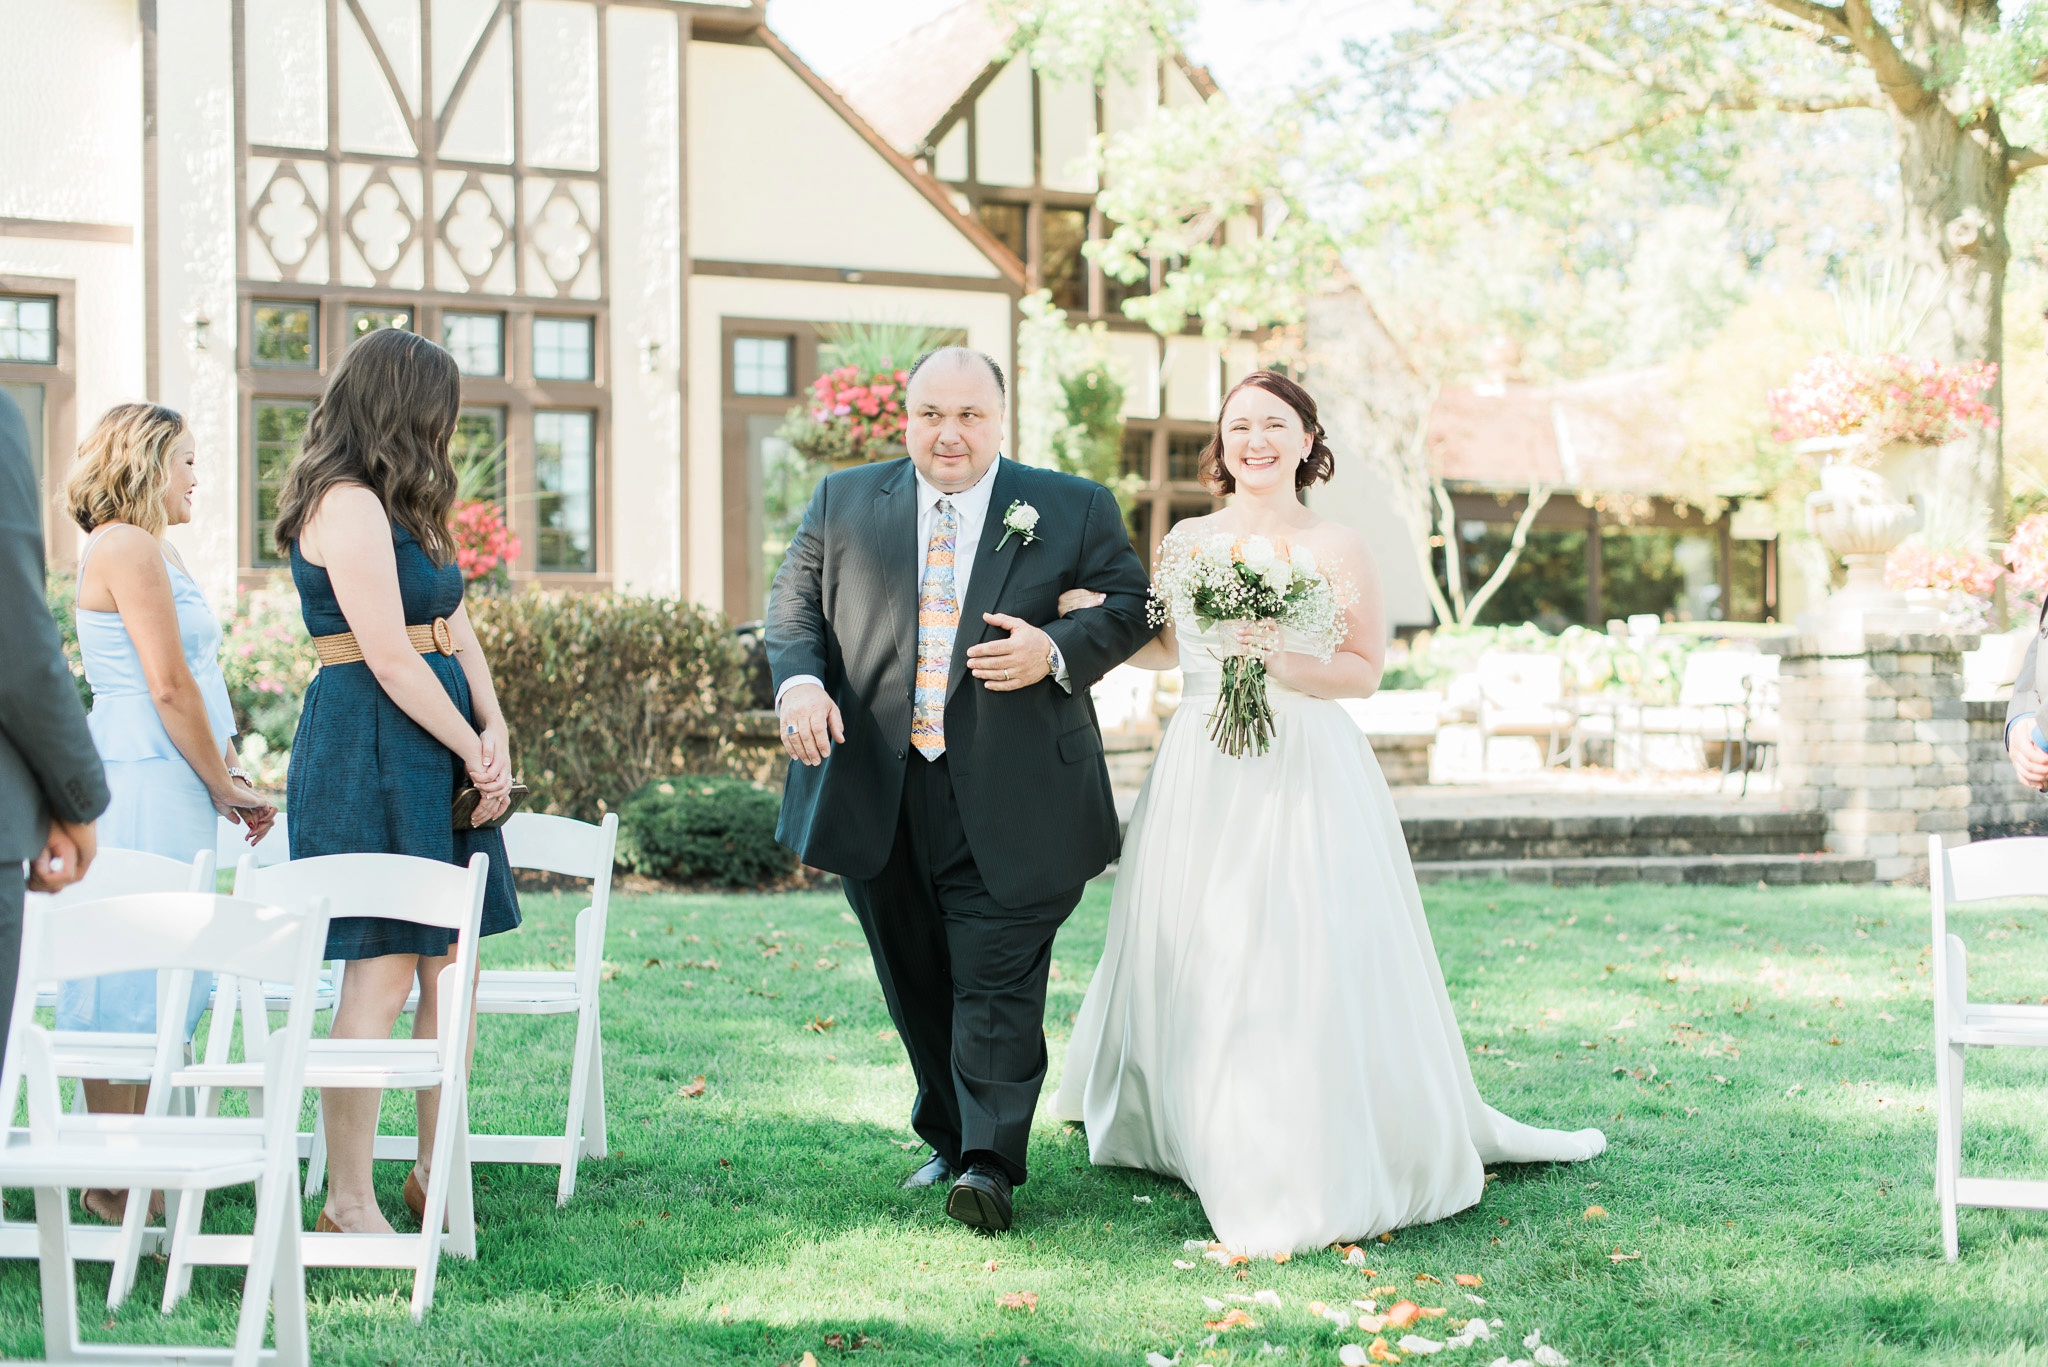 brookside-golf-country-club-wedding-columbus-ohio-62.jpg